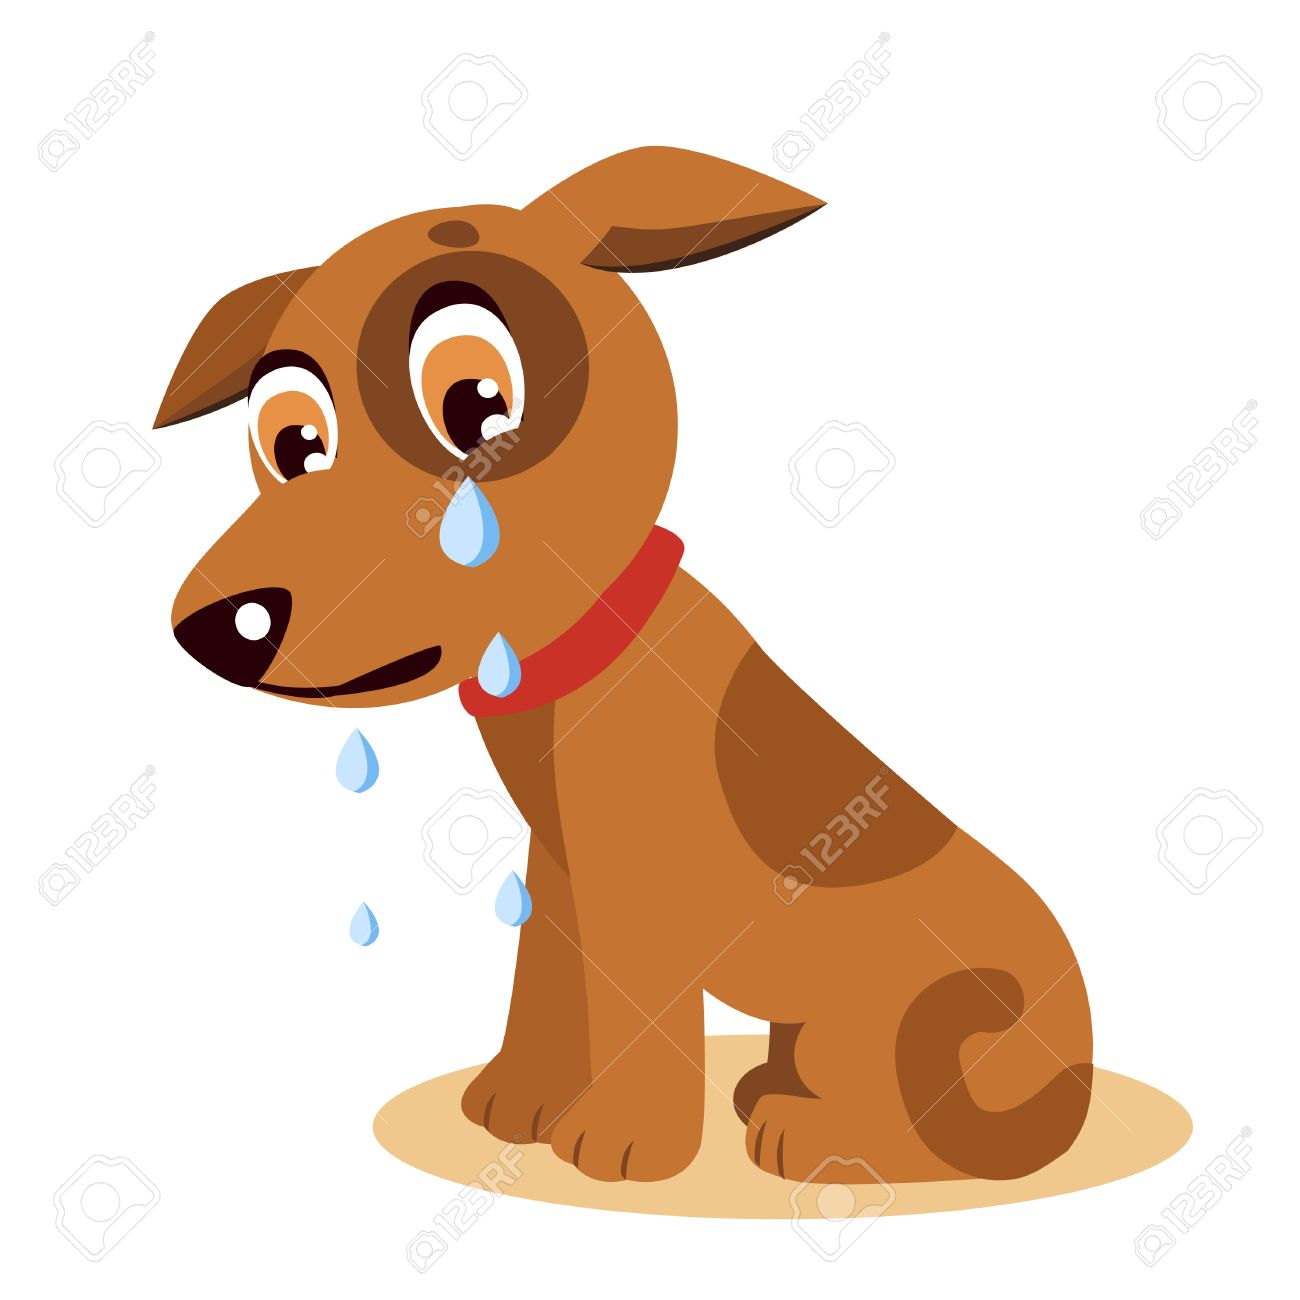 Sad Crying Dog Cartoon Vector Illustration. Dog With Tears. Crying...